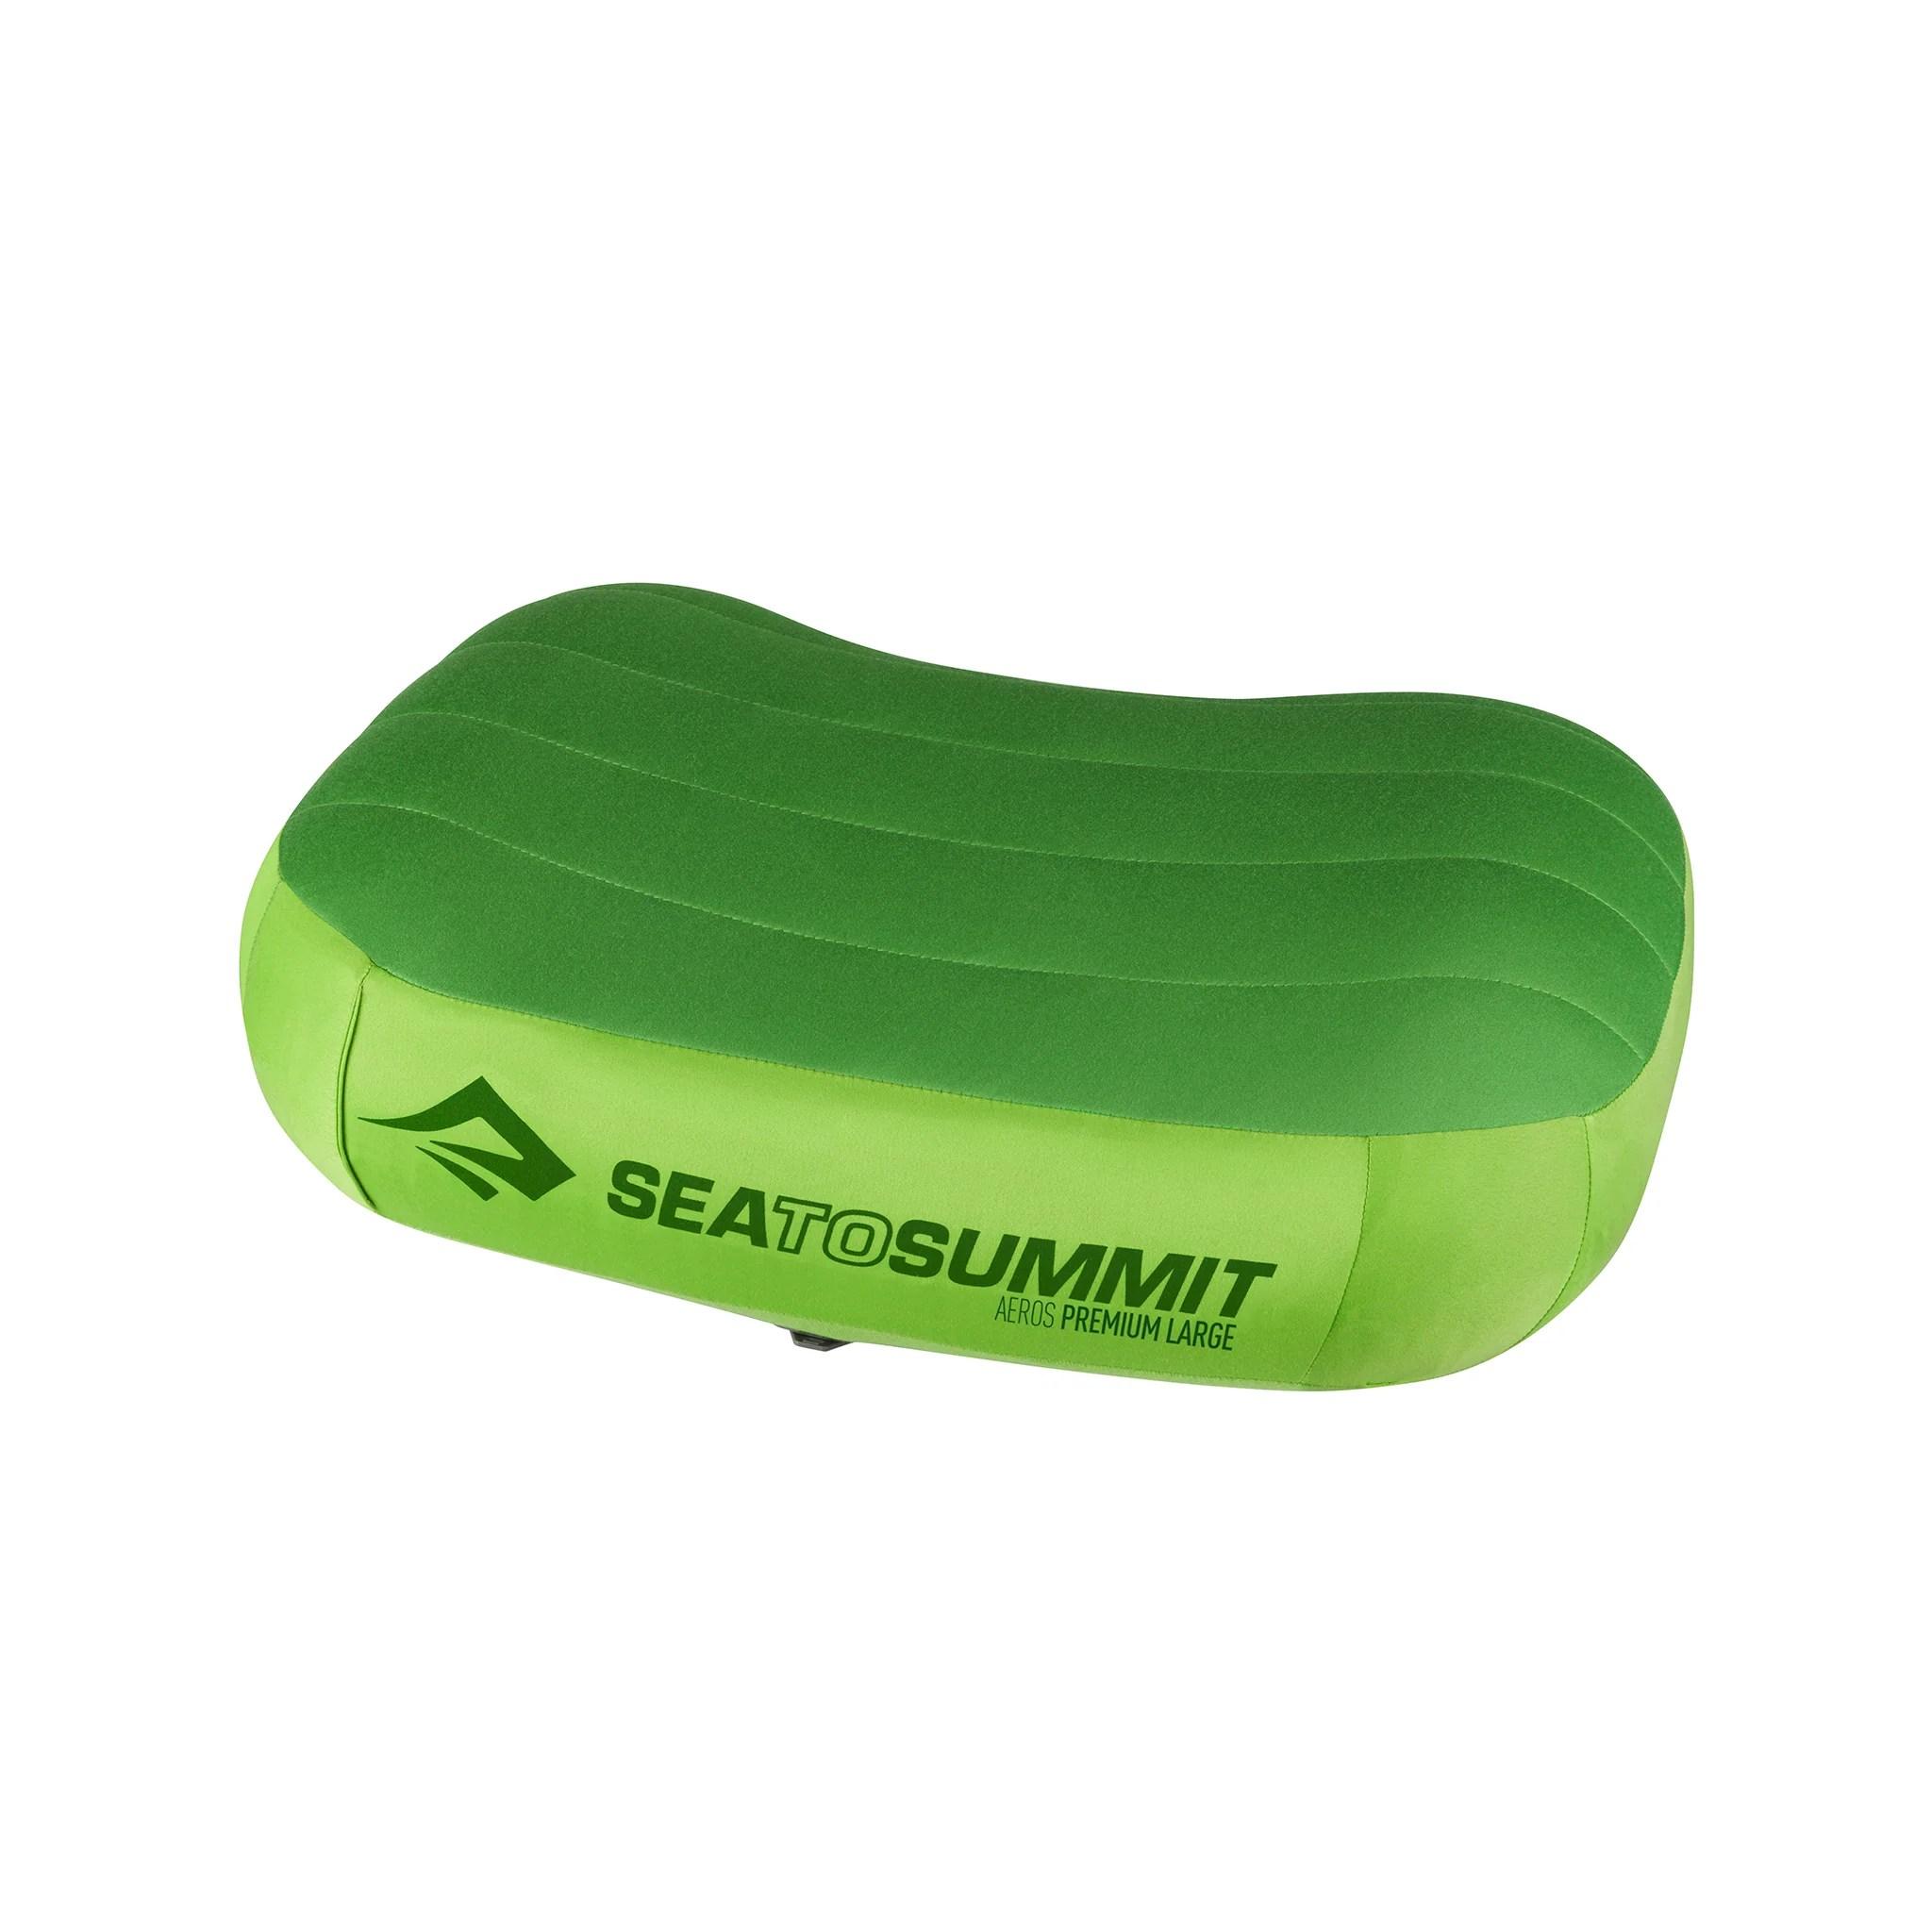 https seatosummitusa com collections sleep system alice kao products aeros pillow premium